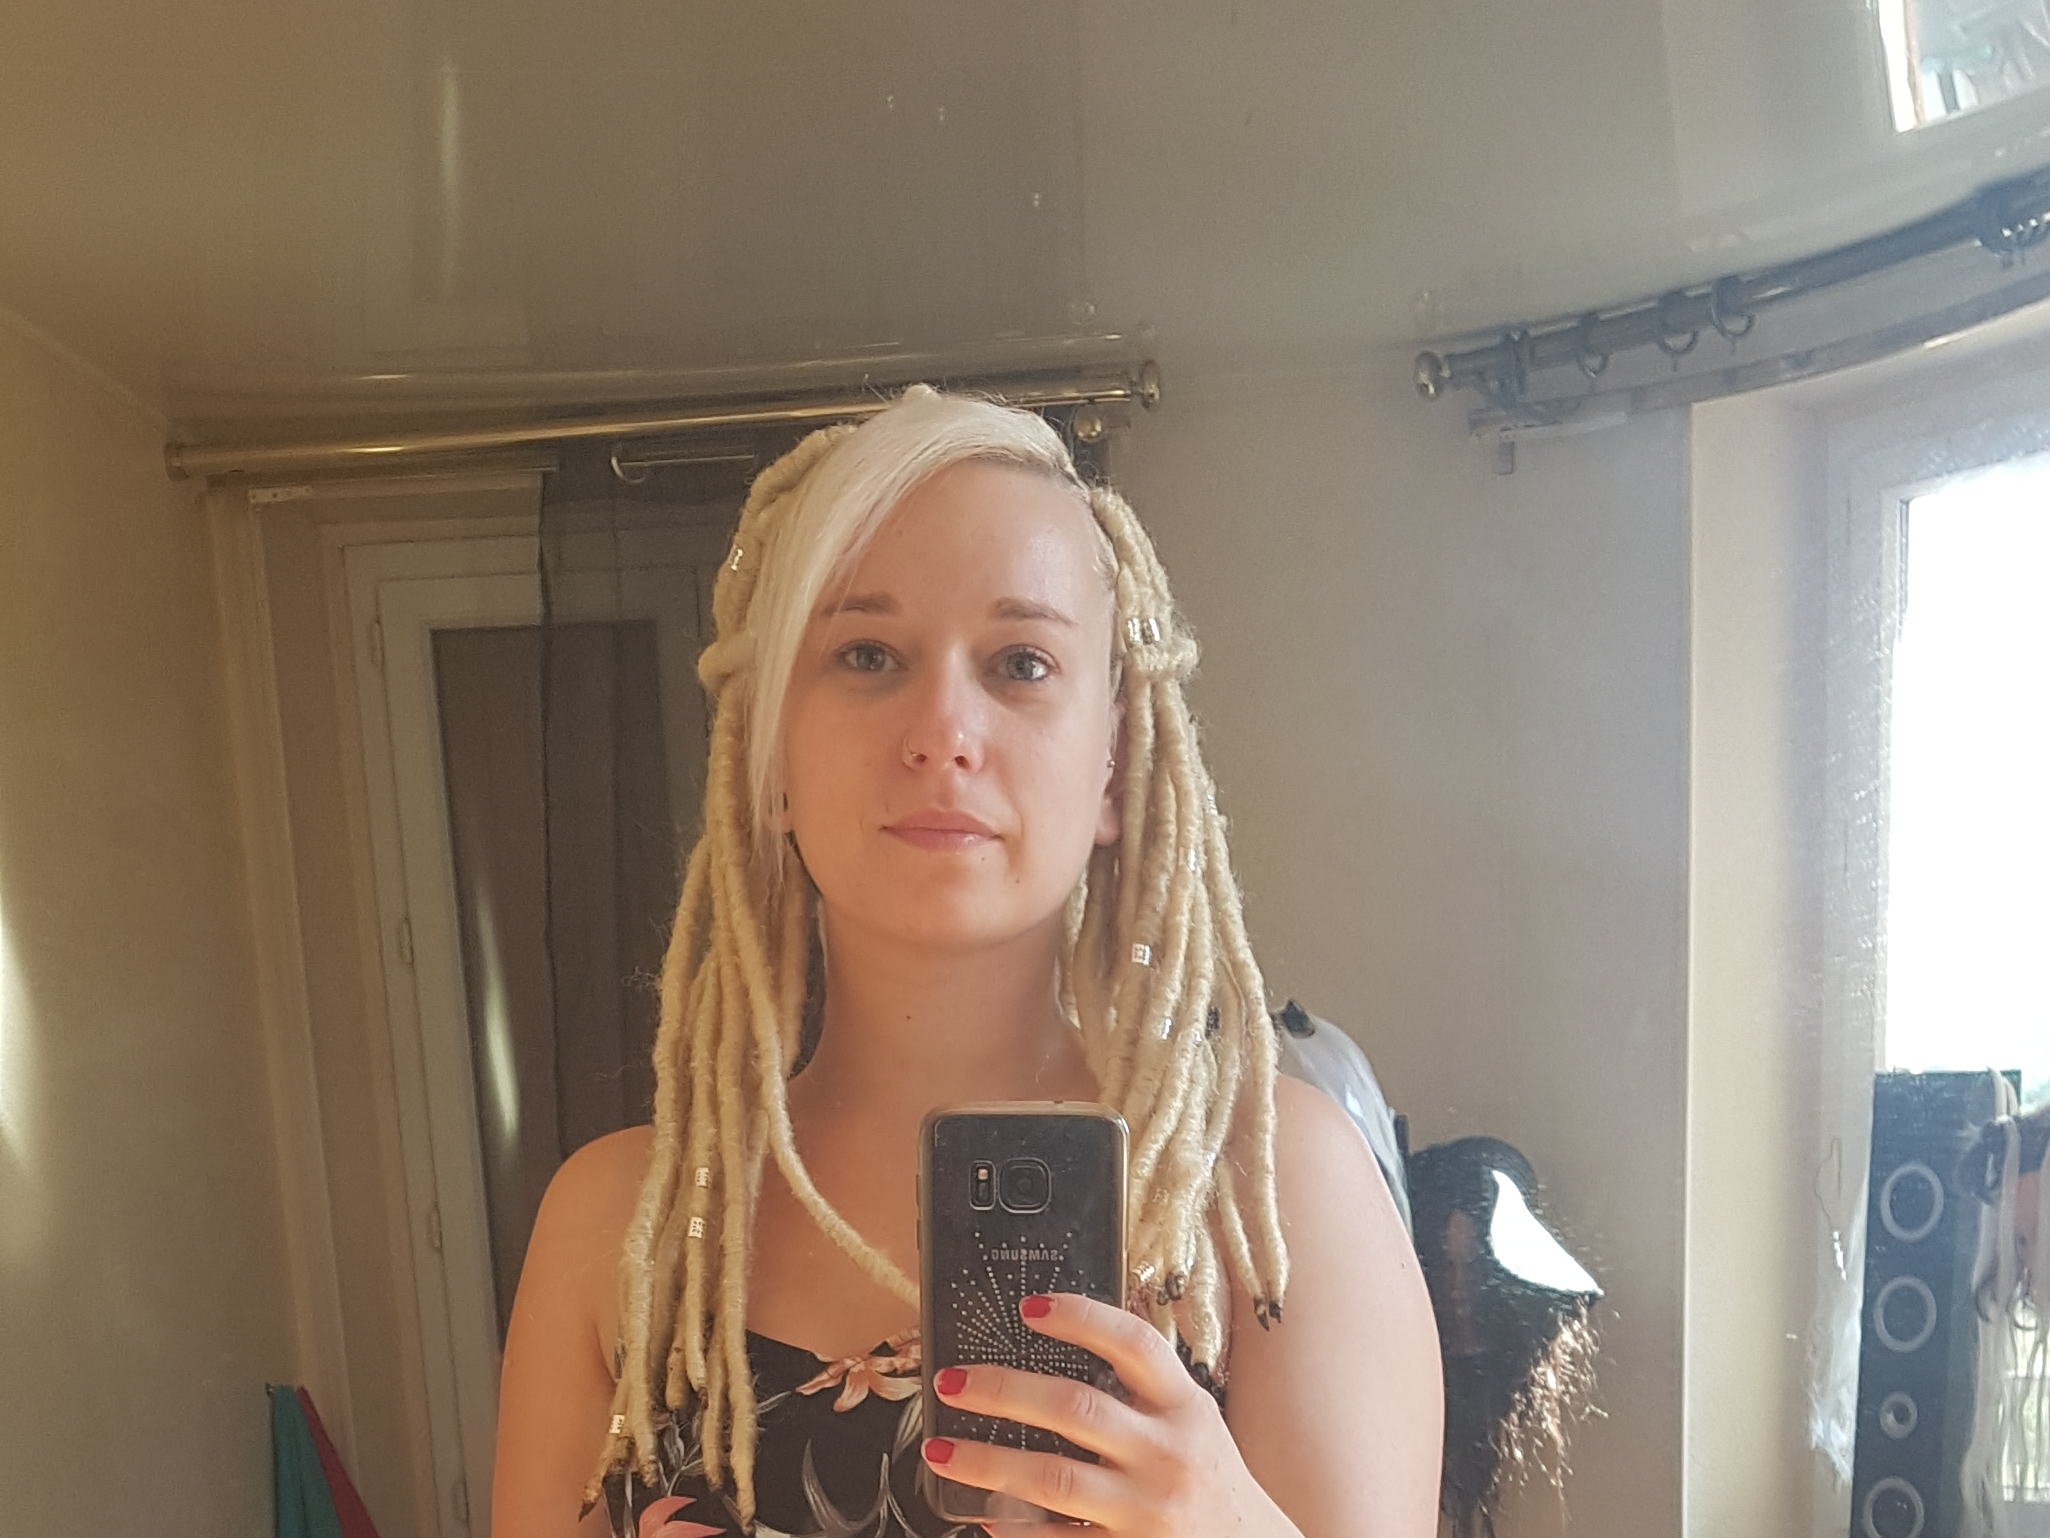 salon de coiffure afro tresse tresses box braids crochet braids vanilles tissages paris 75 77 78 91 92 93 94 95 TNJDTCGK